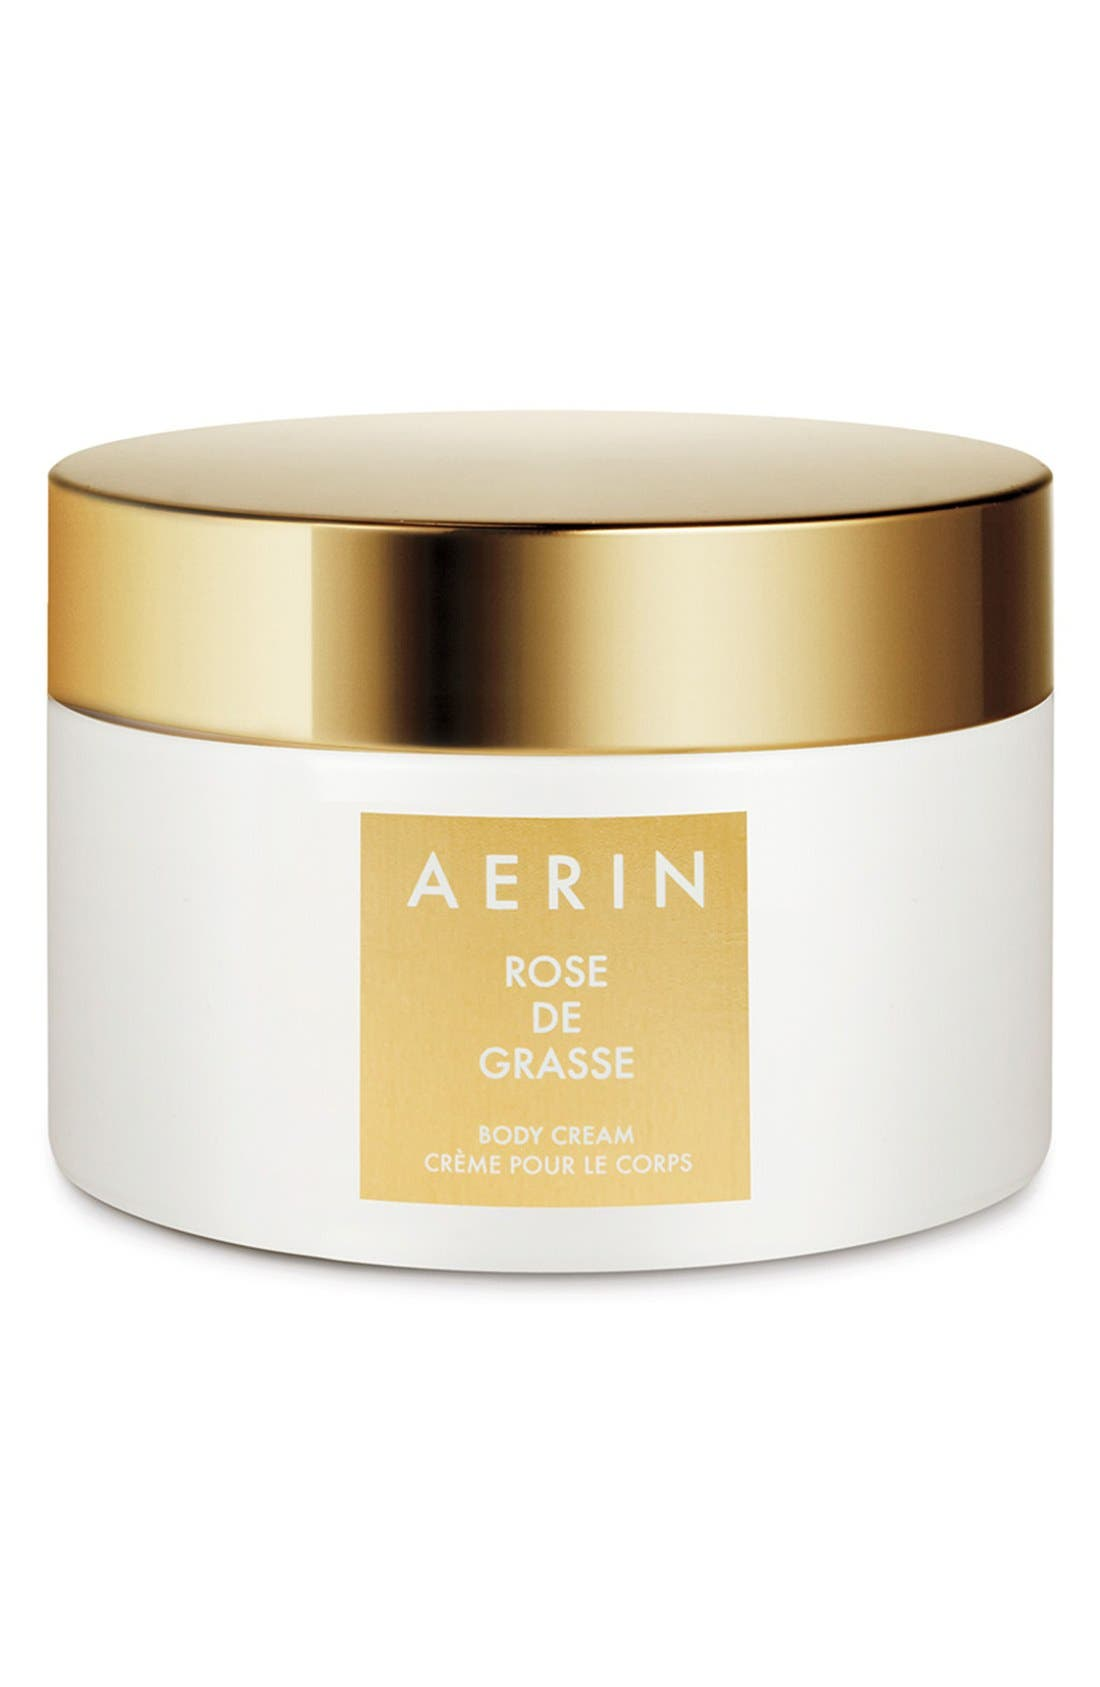 AERIN Beauty Rose de Grasse Body Cream,                             Main thumbnail 1, color,                             NO COLOR